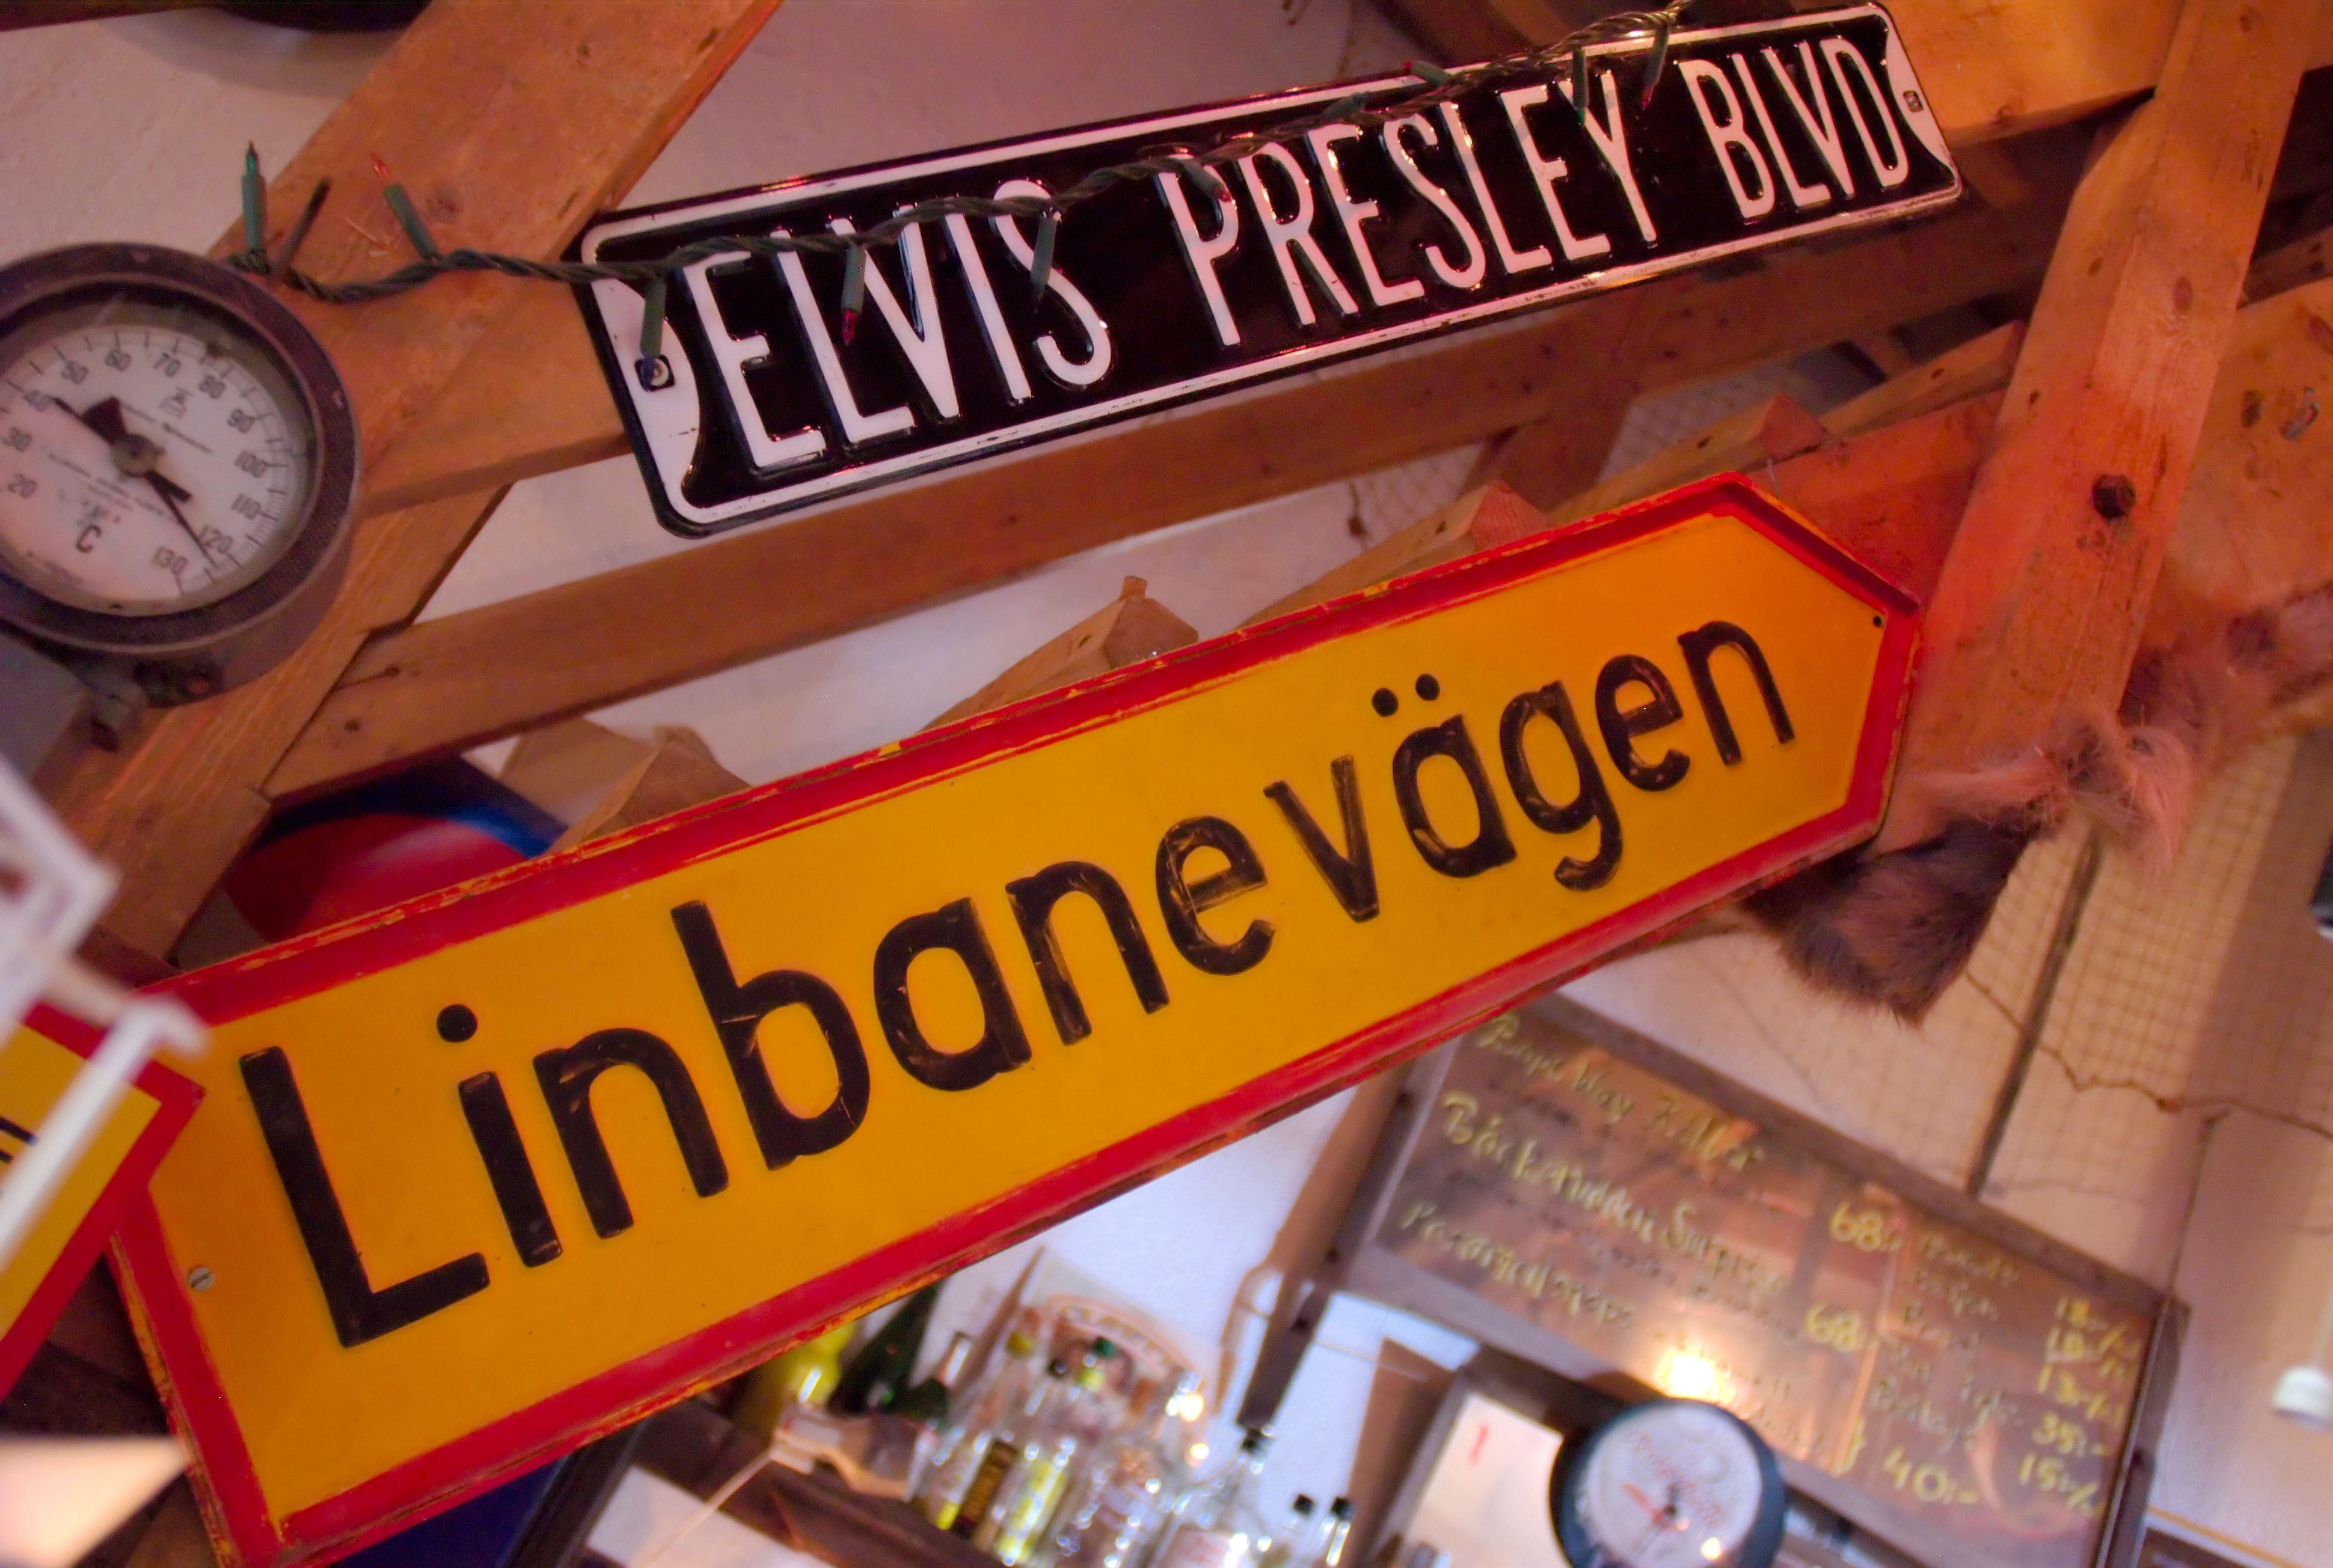 Gruvlaven Bäckerudden - Krogen i skogen (Tavern in the Woods)